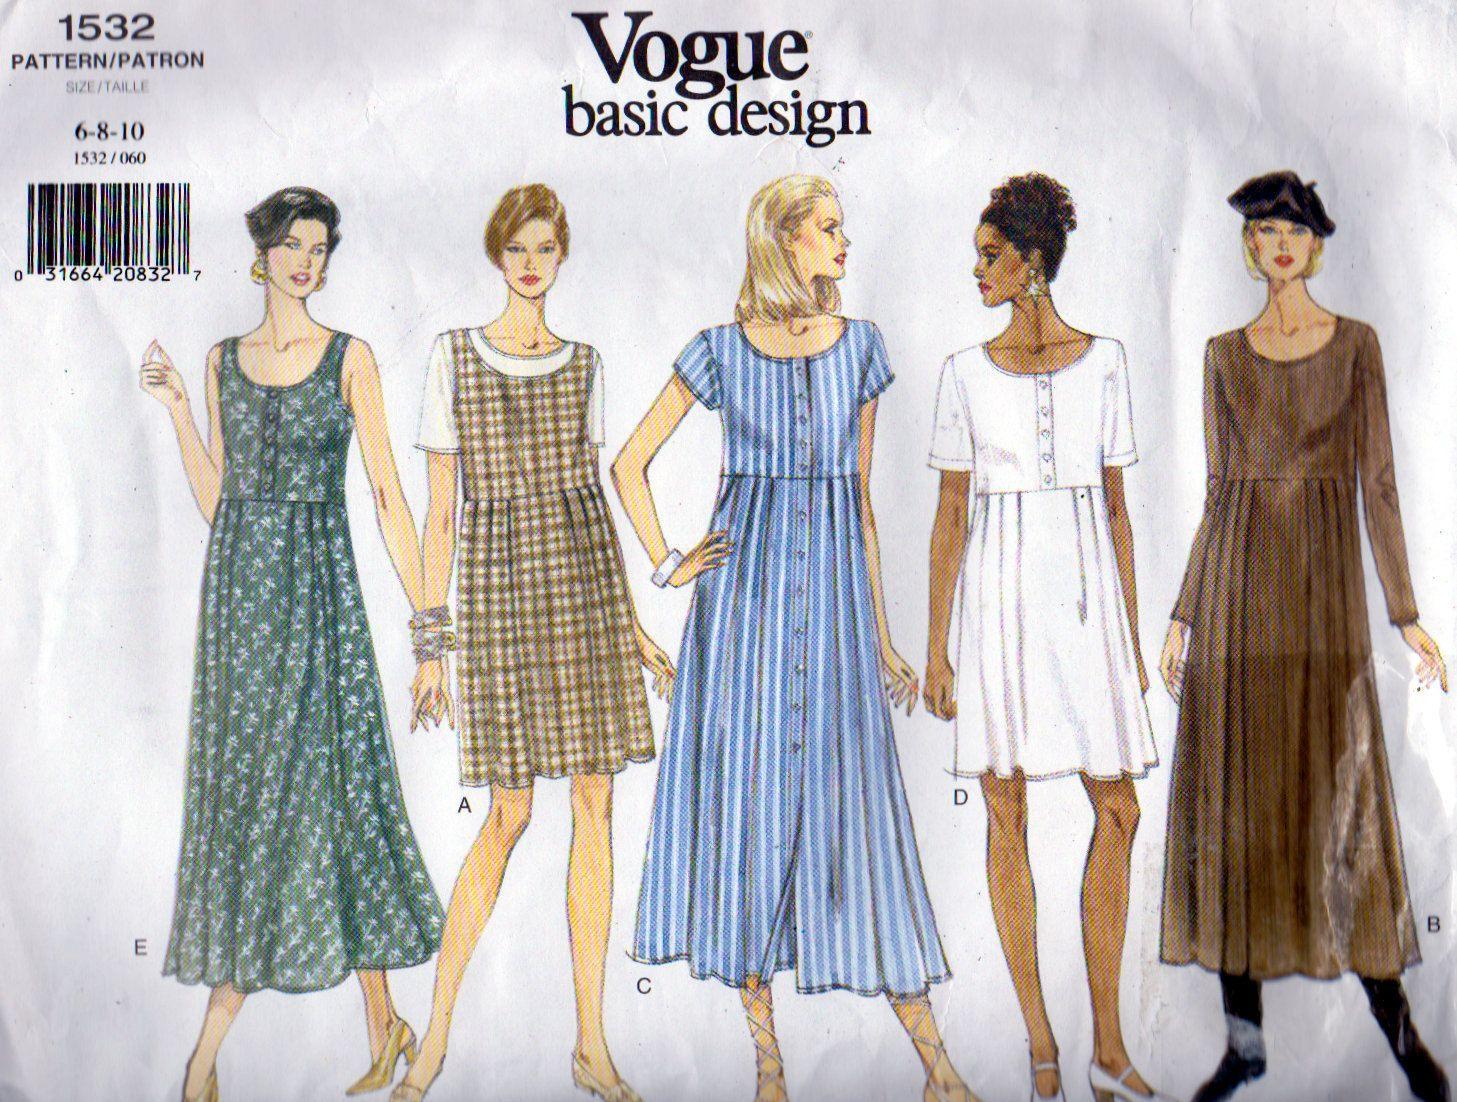 Vogue 1532, Vogue Basic Design Misses Dress Sewing Pattern, Easy To ...